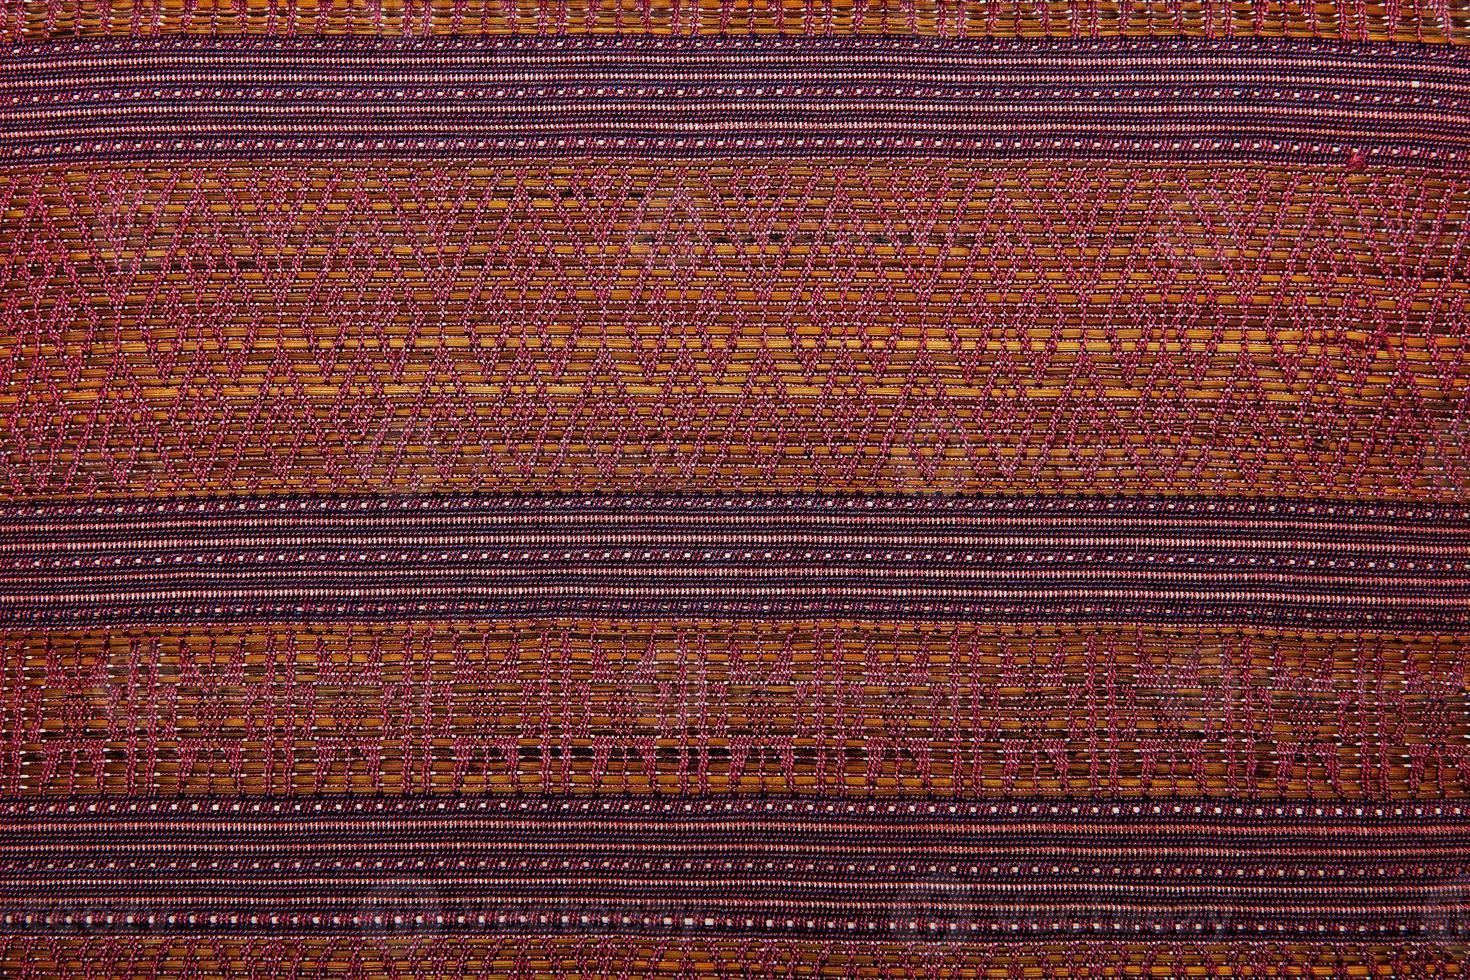 kleurrijke Afrikaanse Peruaanse stijl tapijt oppervlak close-up foto